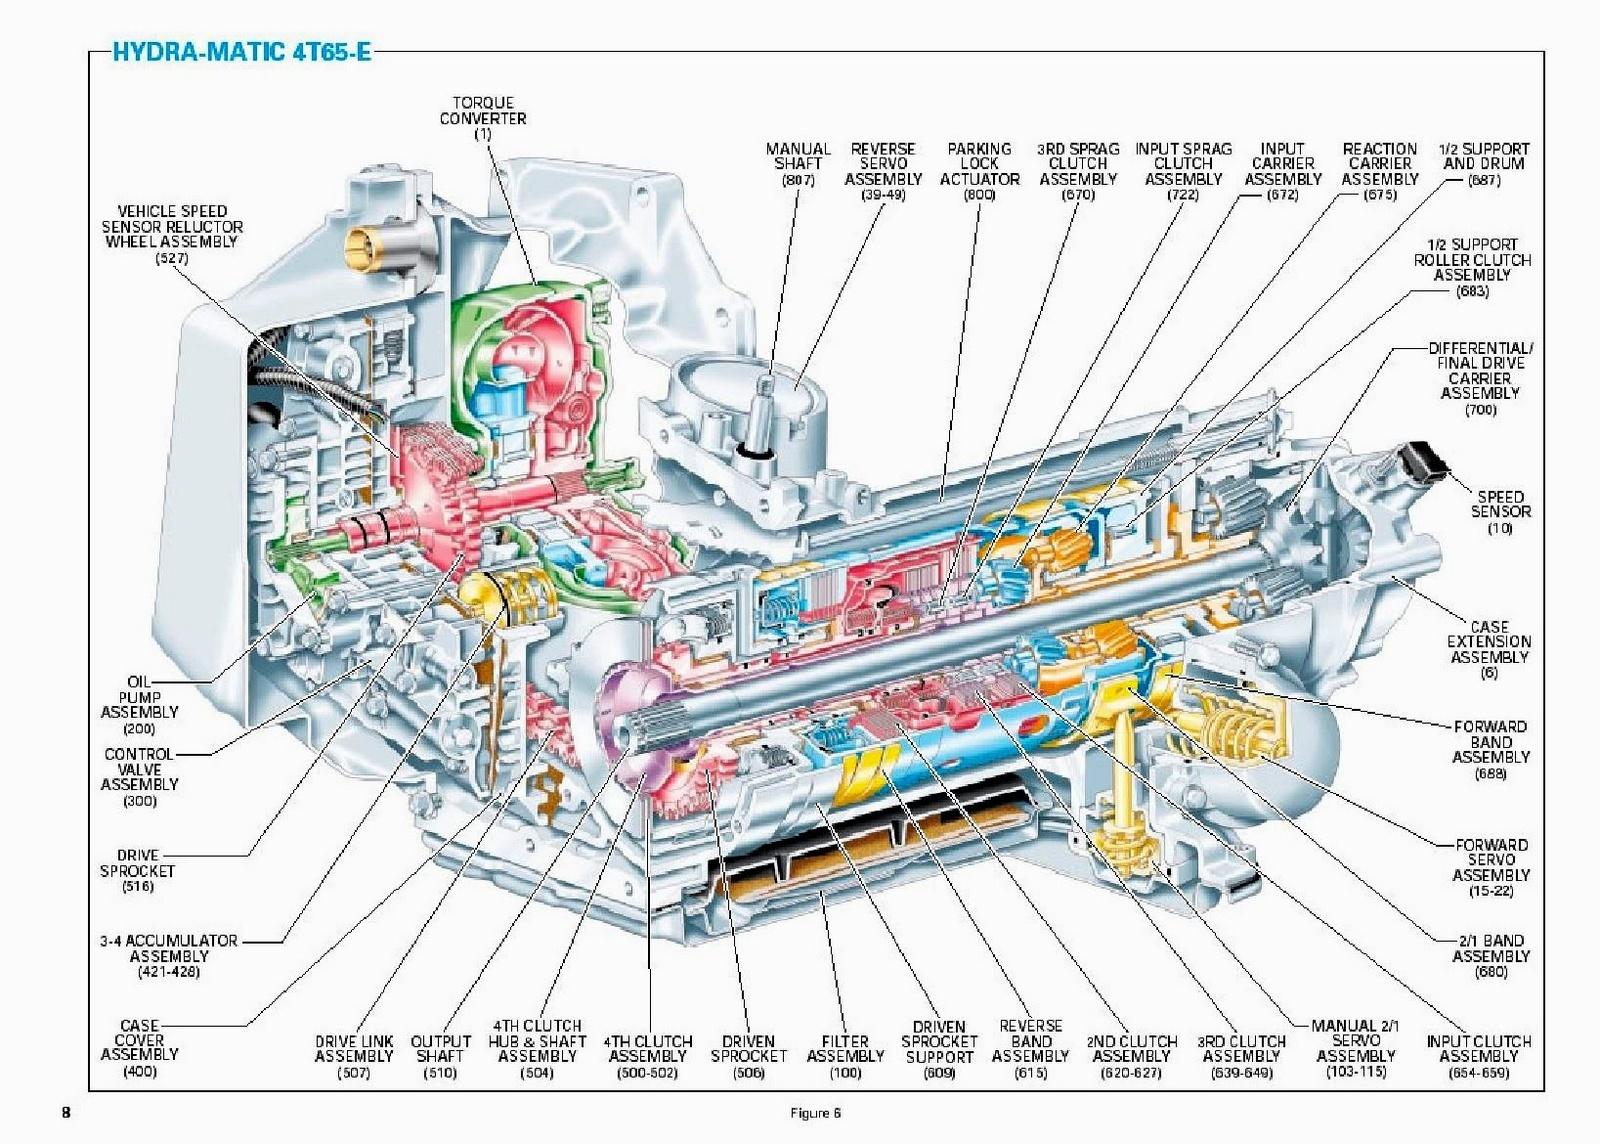 2000 chevy silverado transmission diagram - wiring diagram replace  selection-notice - selection-notice.miramontiseo.it  selection-notice.miramontiseo.it